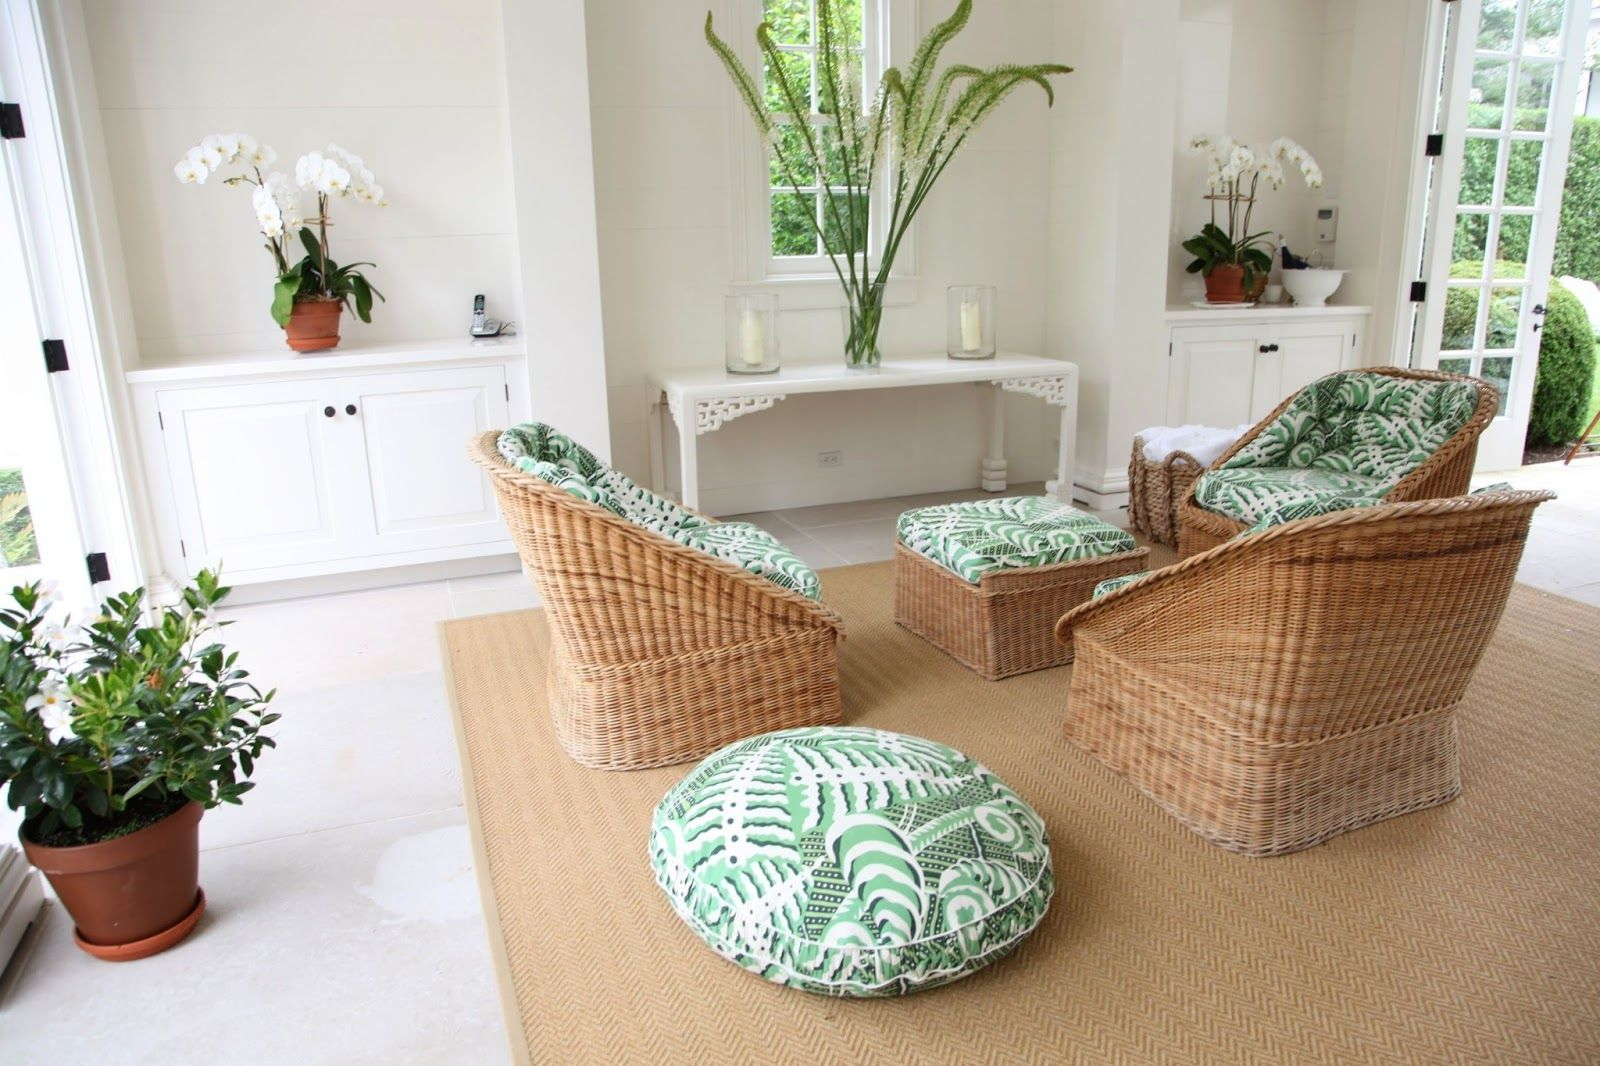 beach house furniture sydney. beach living room furniture house leather couch homemade sydney inspirational interior design ideas for